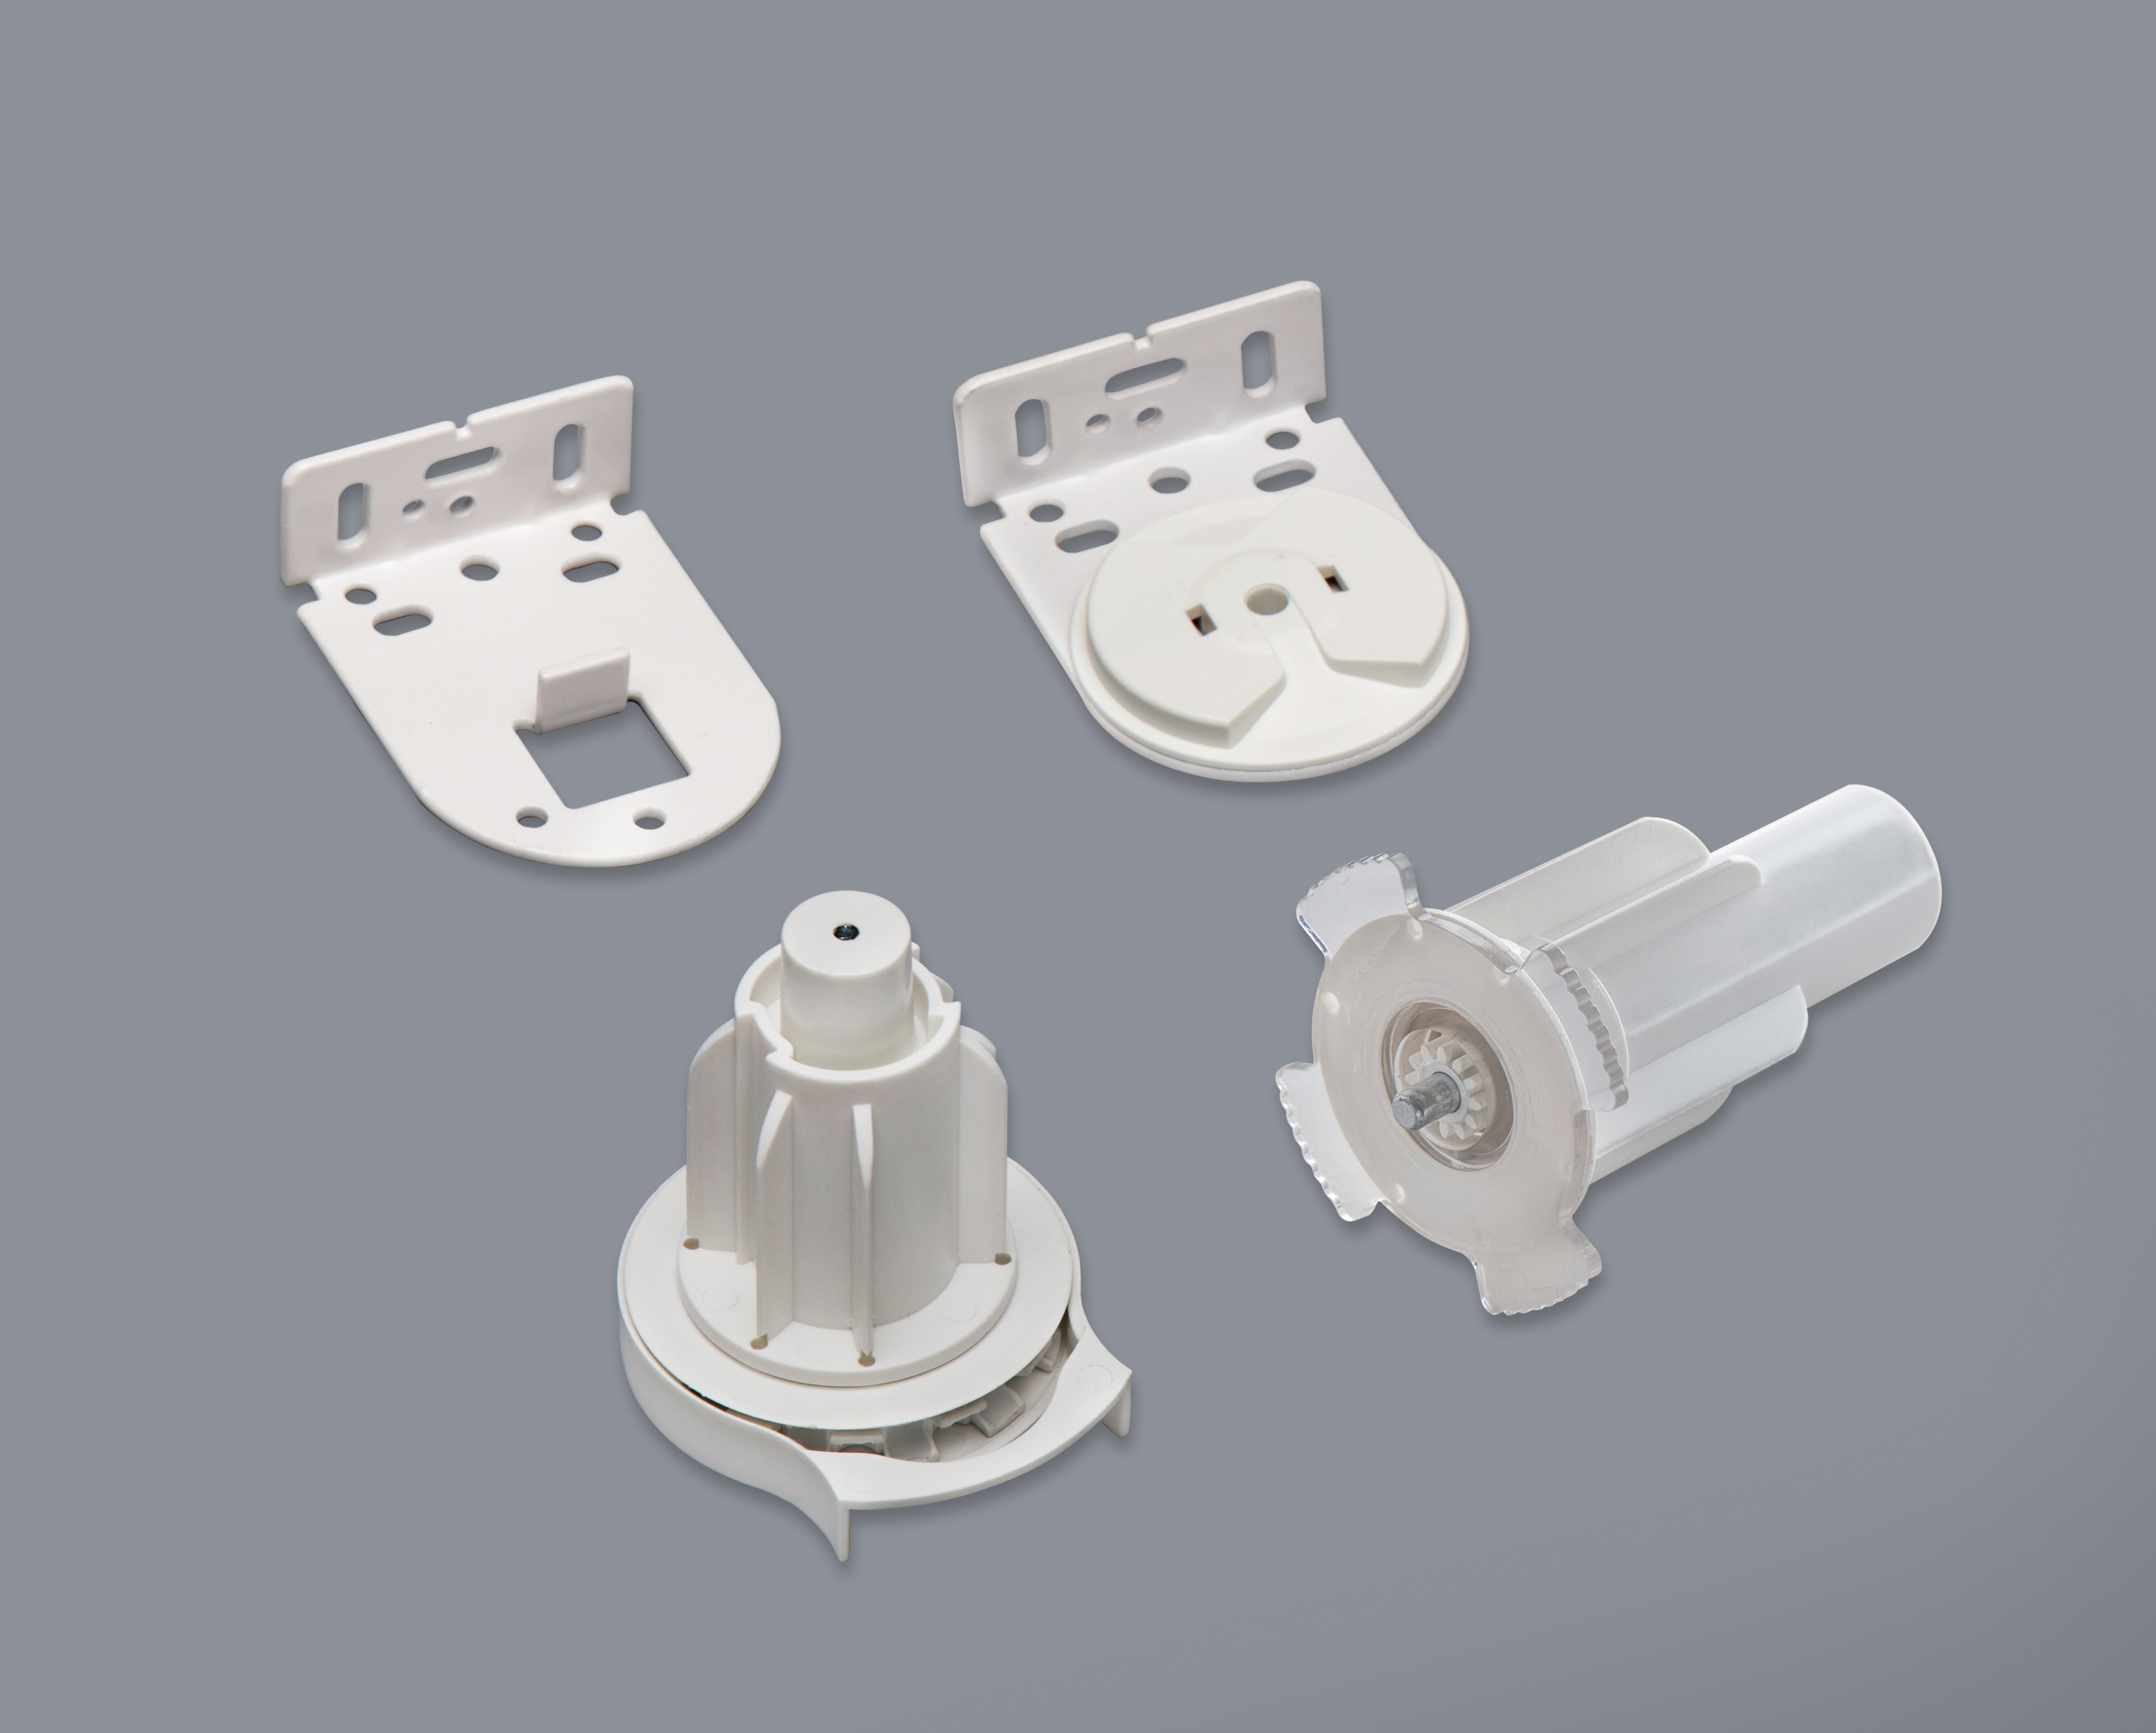 K55-38mmRotatable cltuch1:1.5